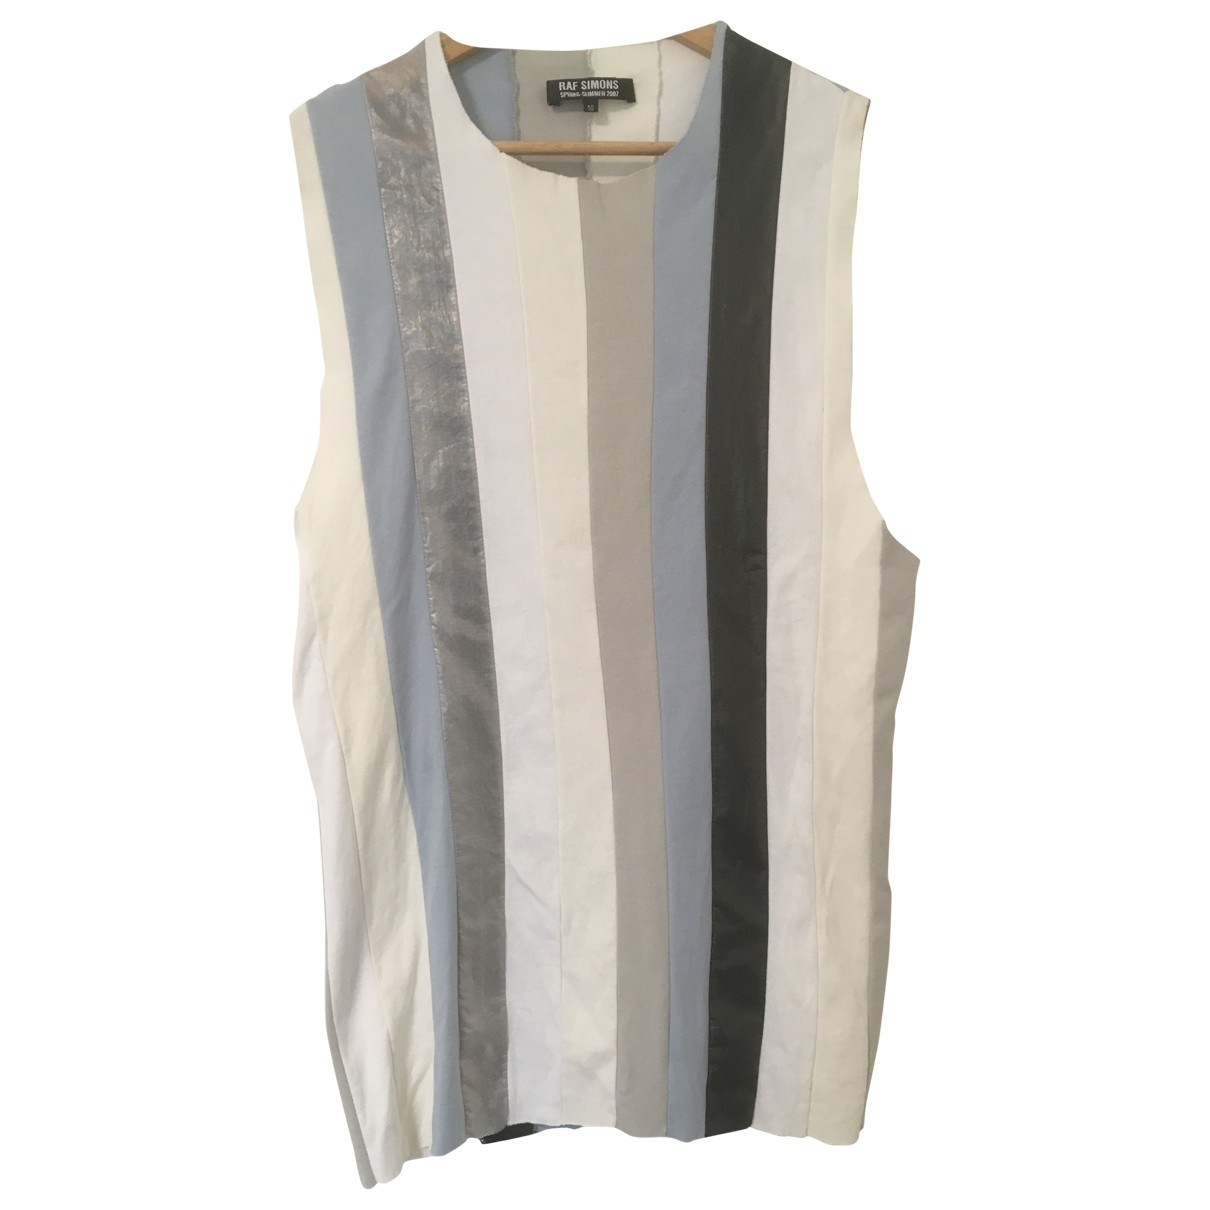 Raf Simons - Tee shirts   pour homme en coton